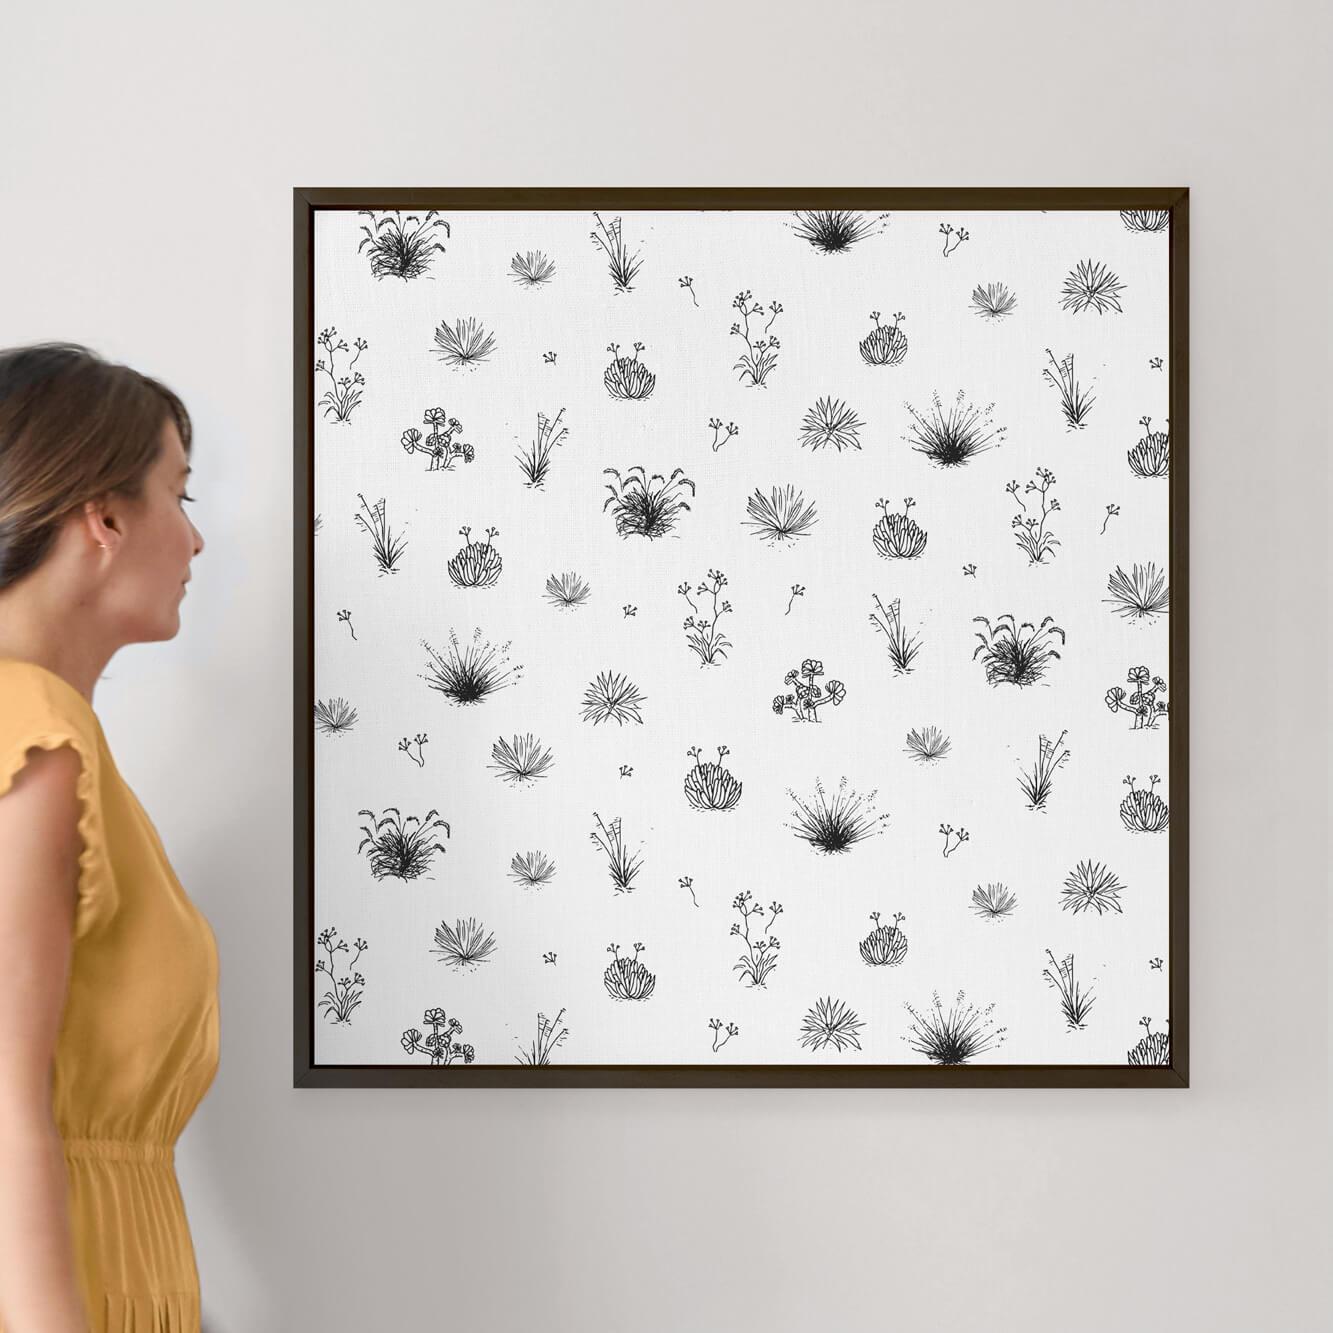 "Silverlake by Tatiana Nogueiras: 30"" x 30"" @ $157.00"